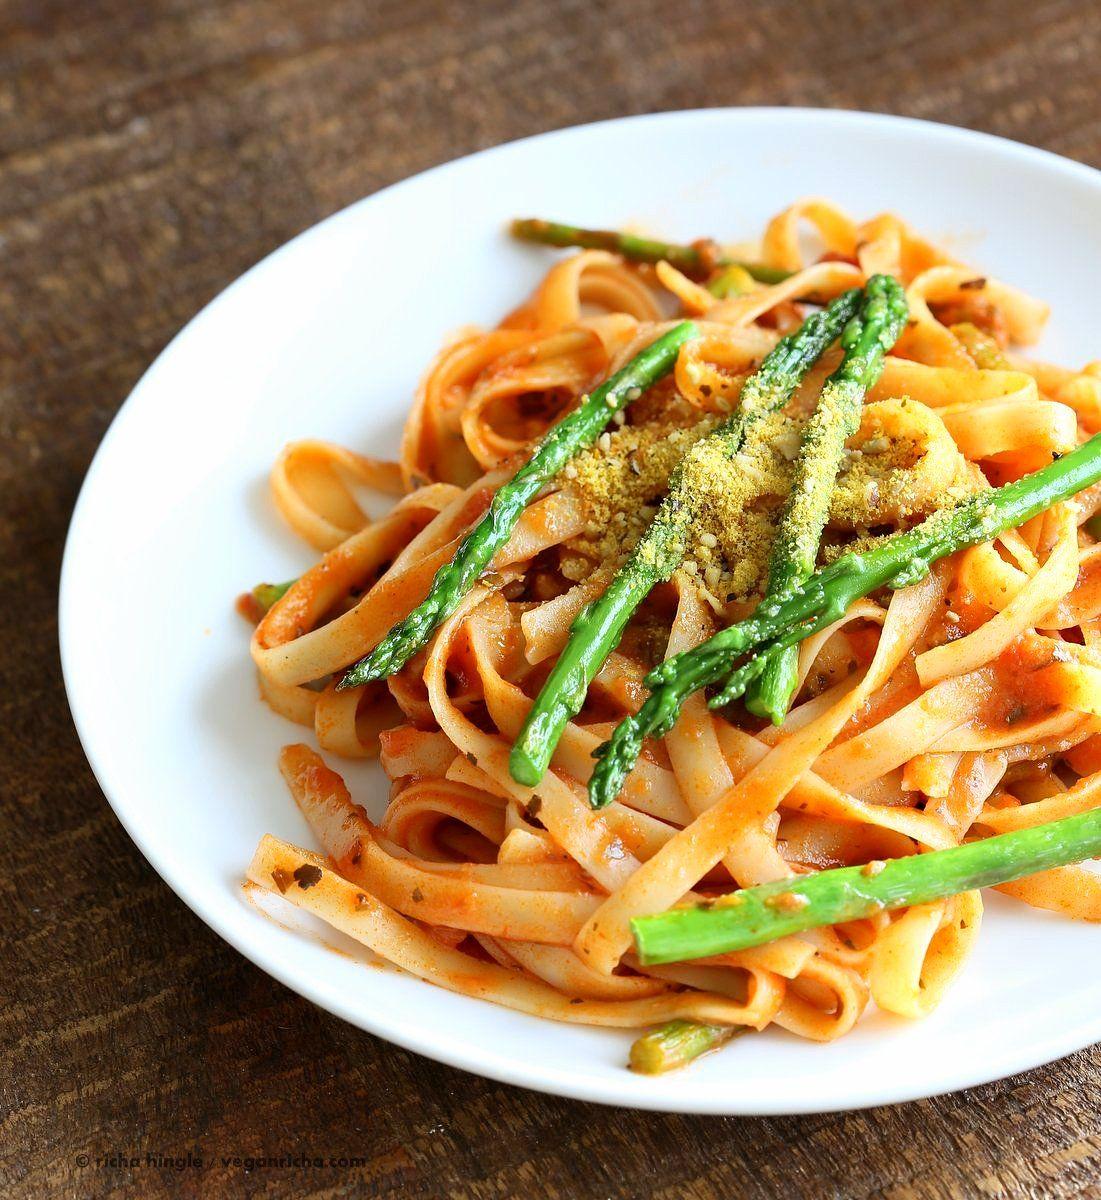 Fettuccine with Tomato Cream Sauce and Asparagus - Vegan Richa